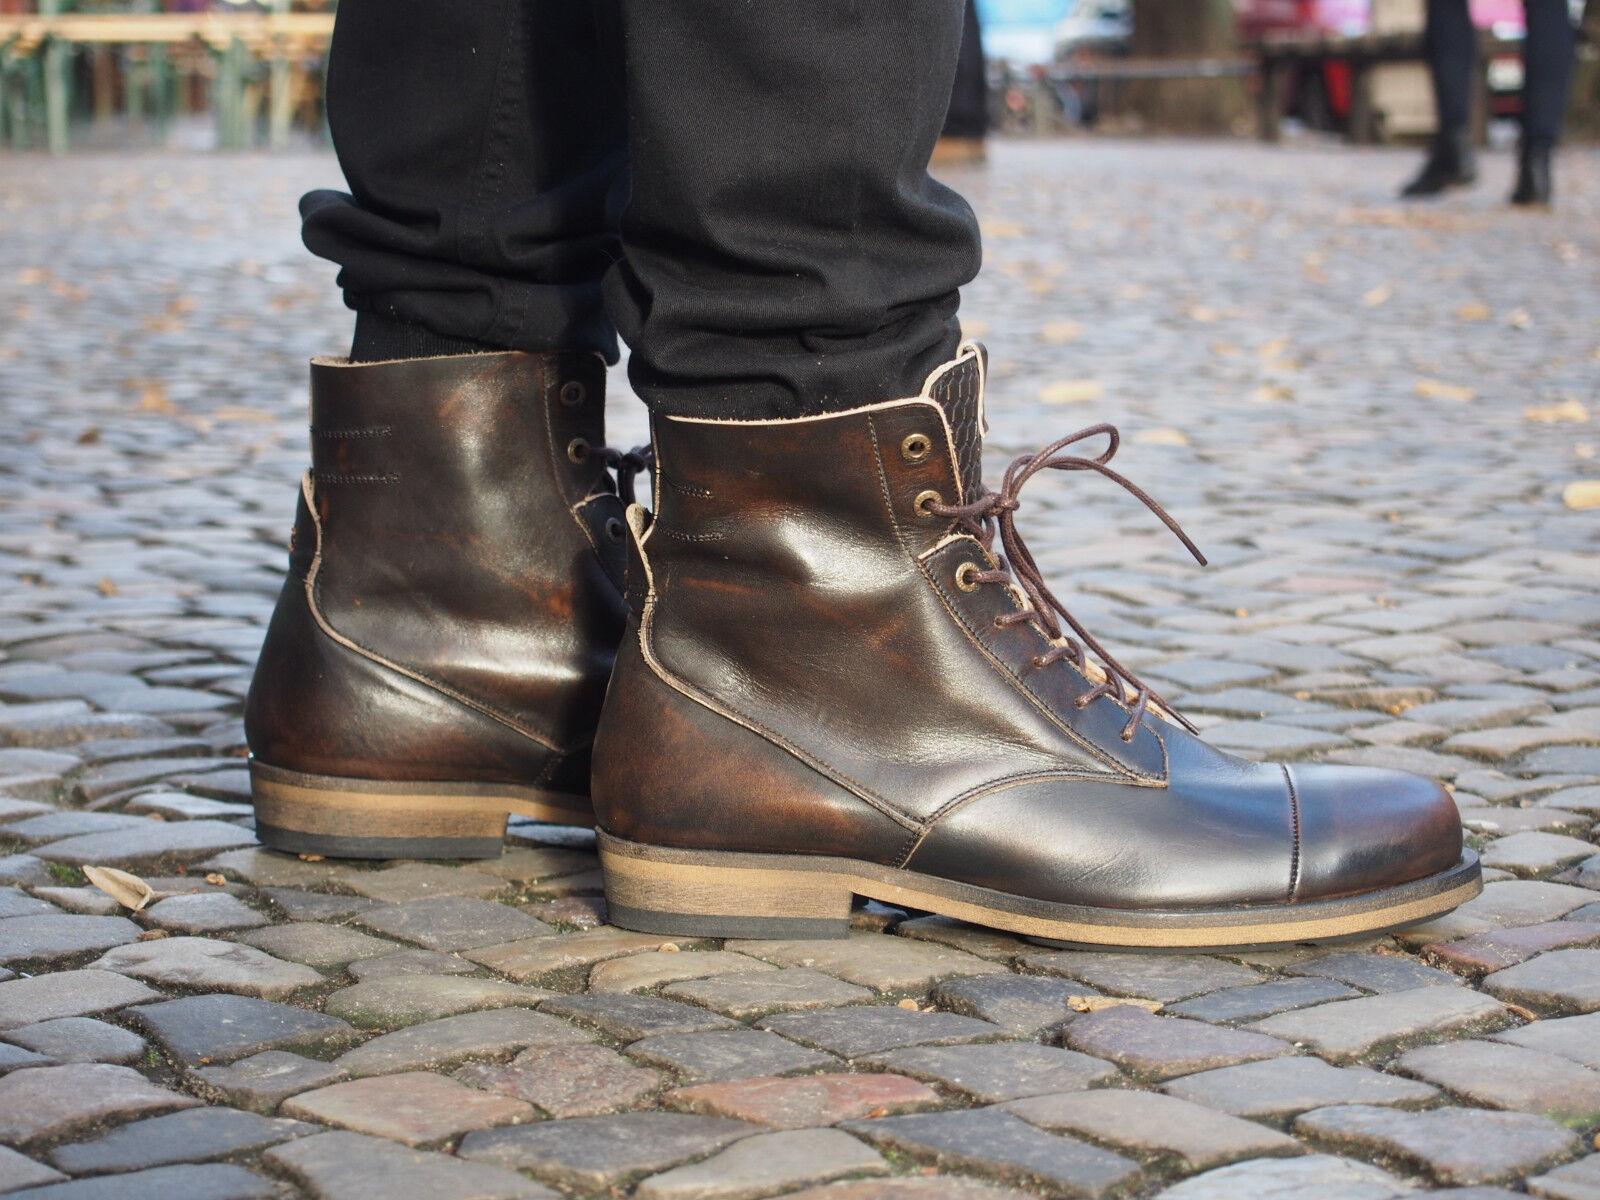 HUB Footwear Herrenschuhe Fullback coffee braun braun braun Stiefelette Echtleder NEU SALE af1ffc